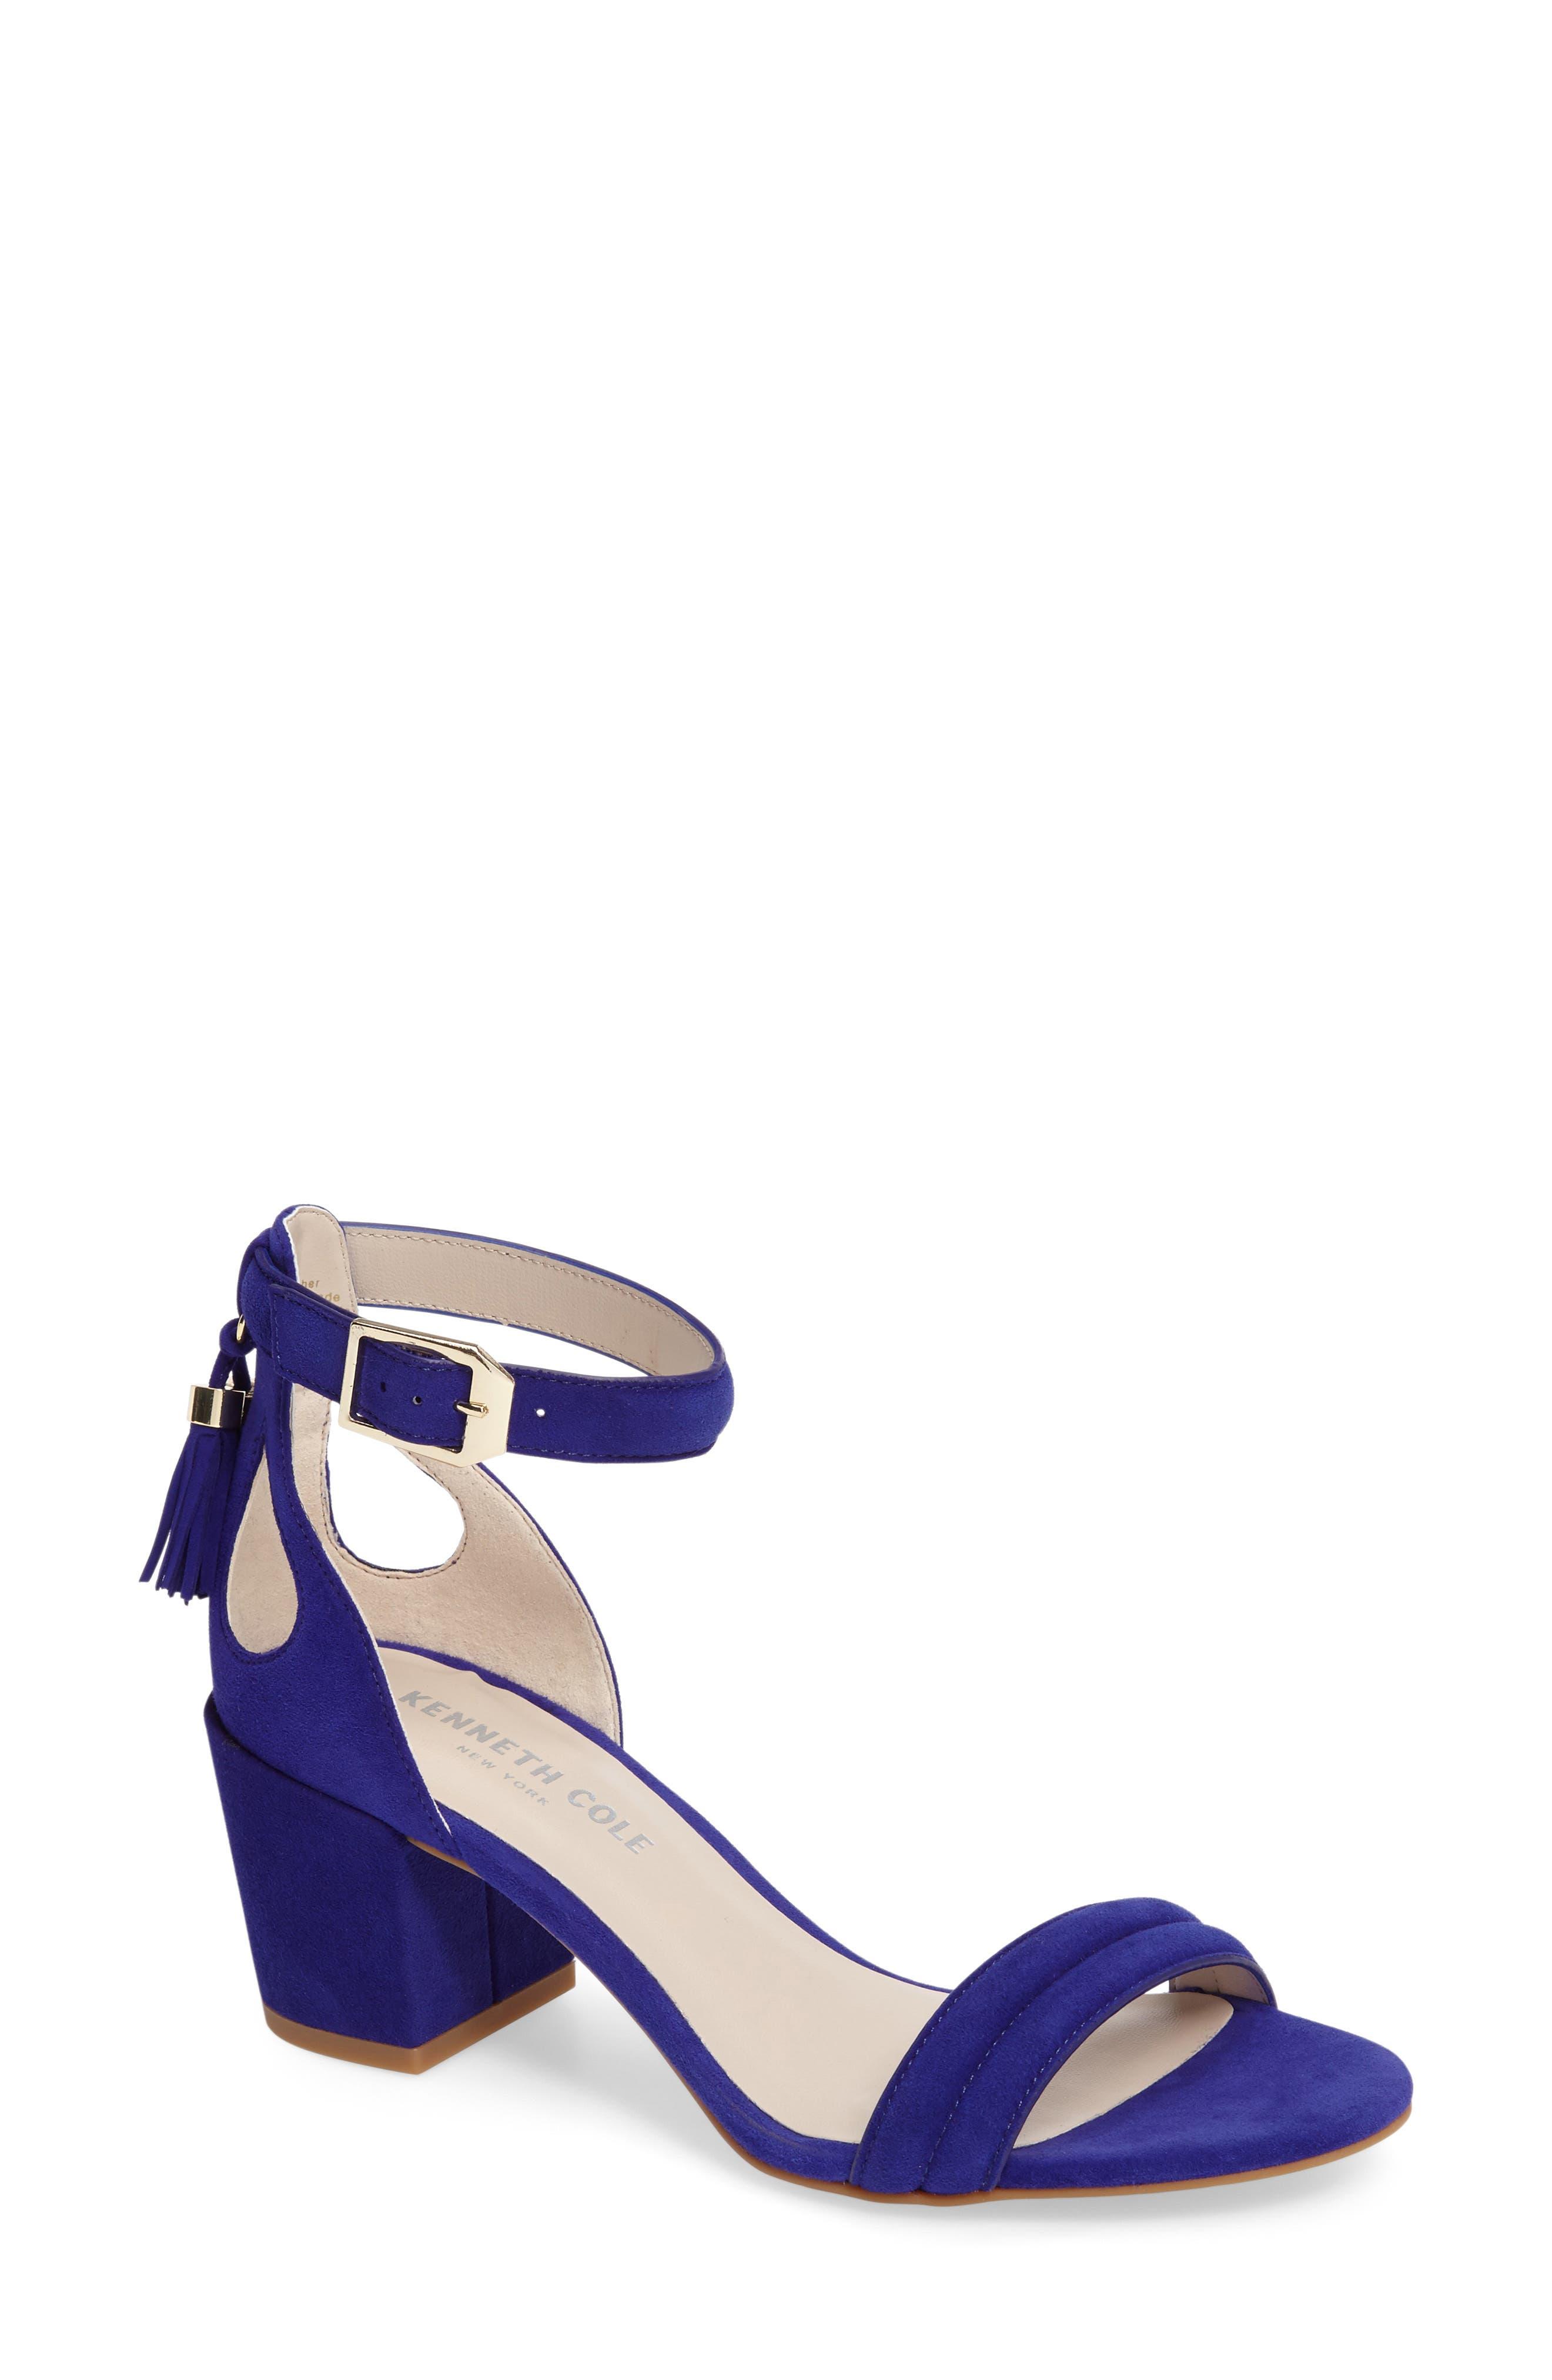 Main Image - Kenneth Cole Harriet Ankle Strap Sandal (Women)